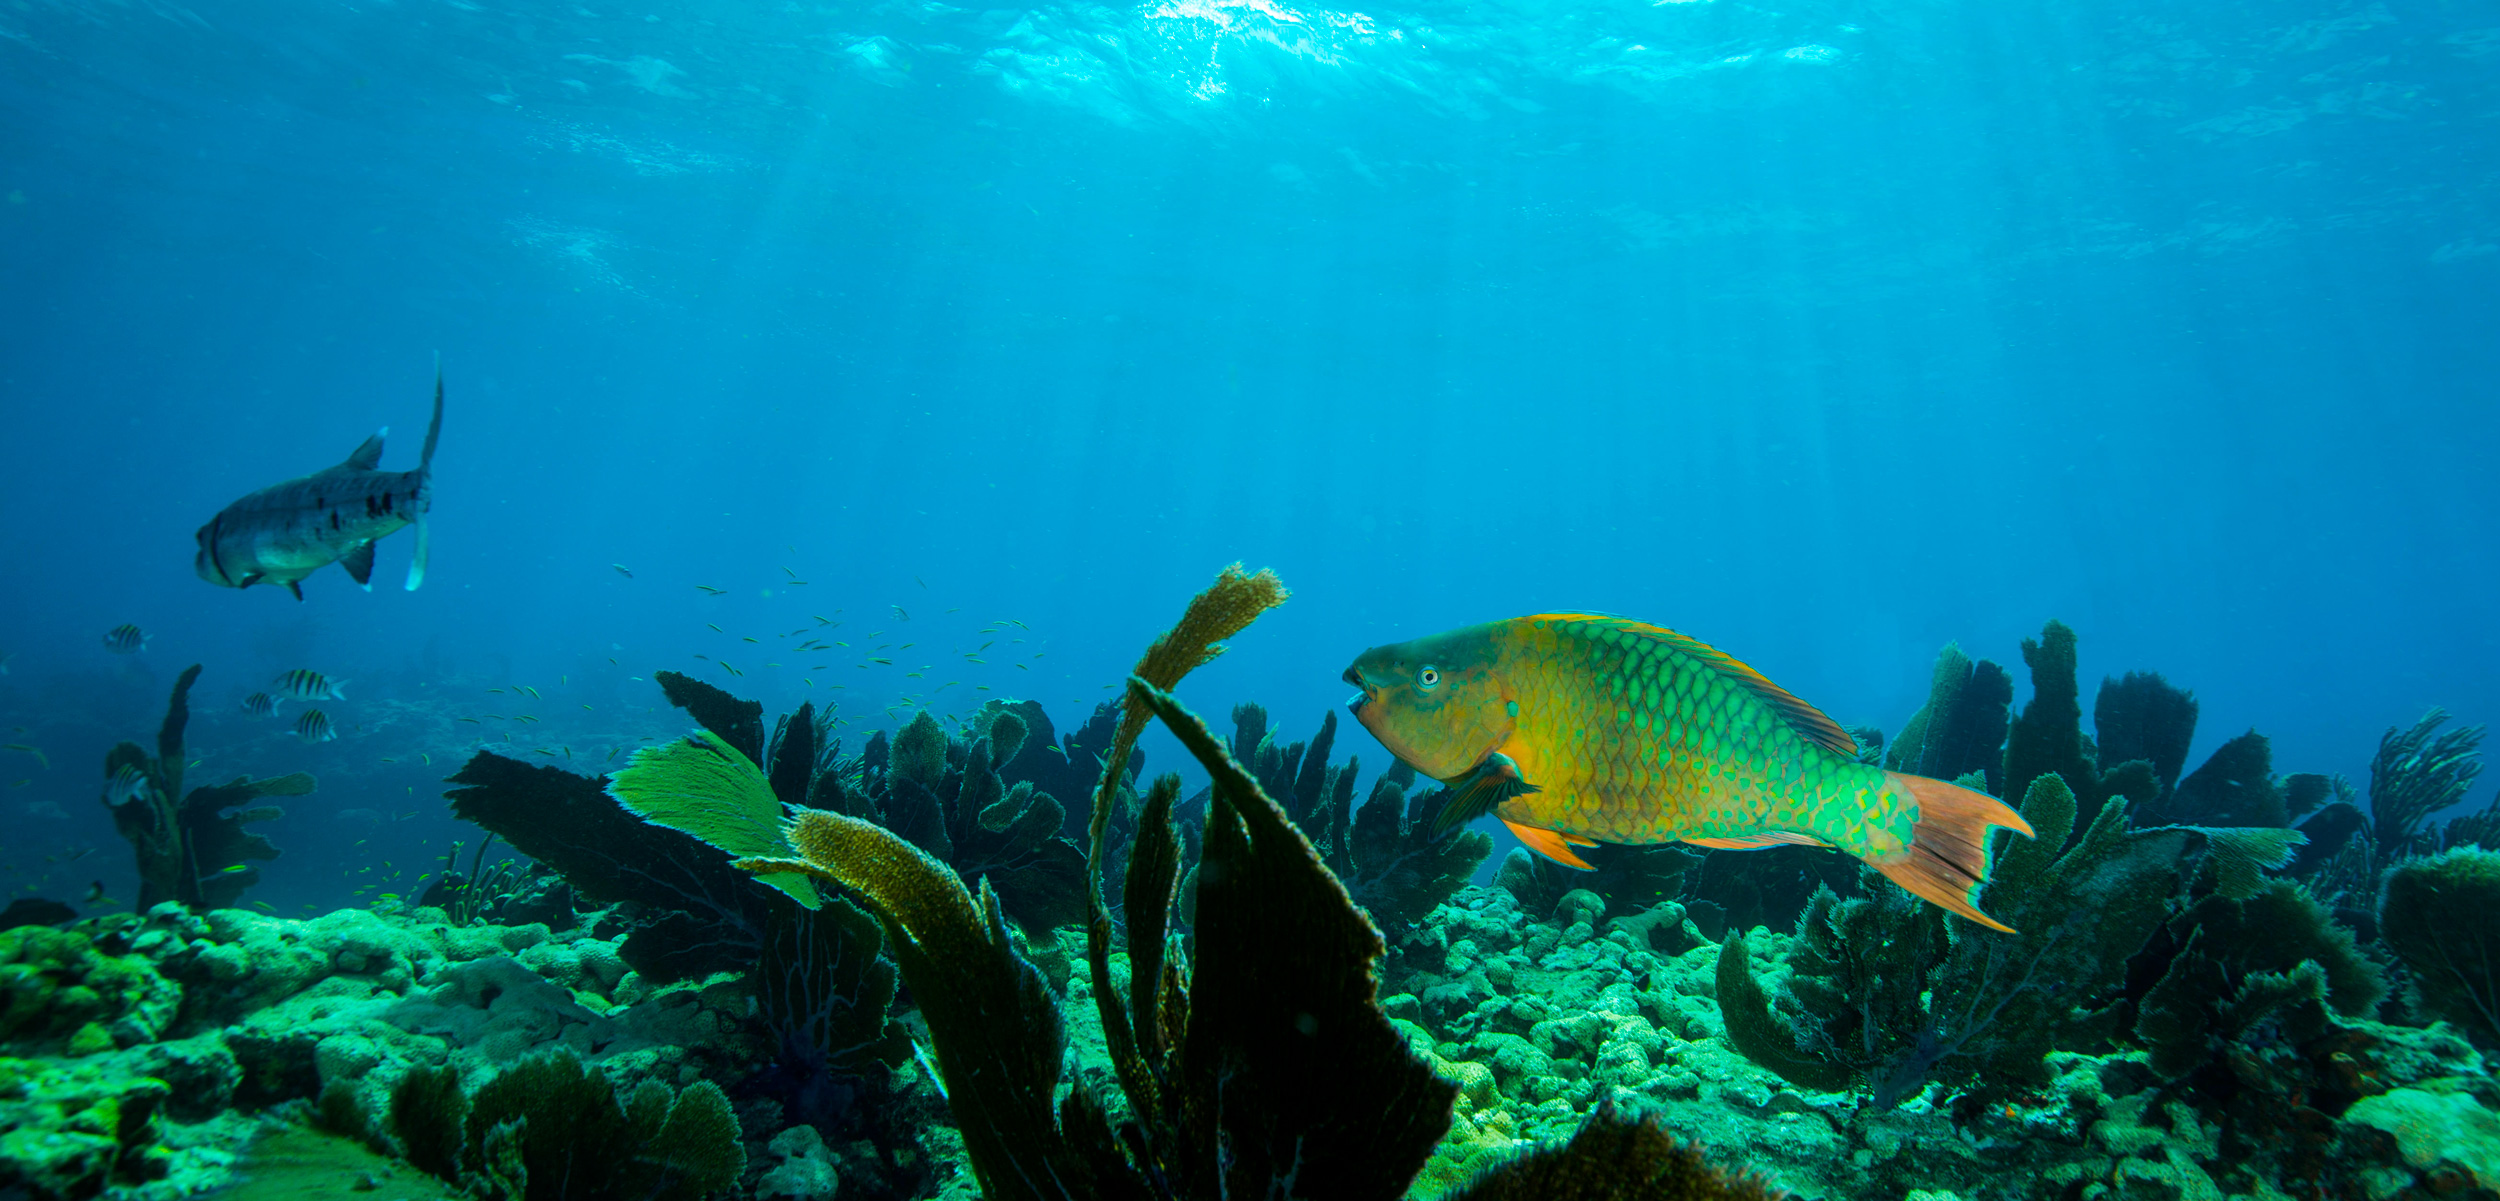 Rainbow parrotfish (Scarus guacamaia) swimming above coral reef